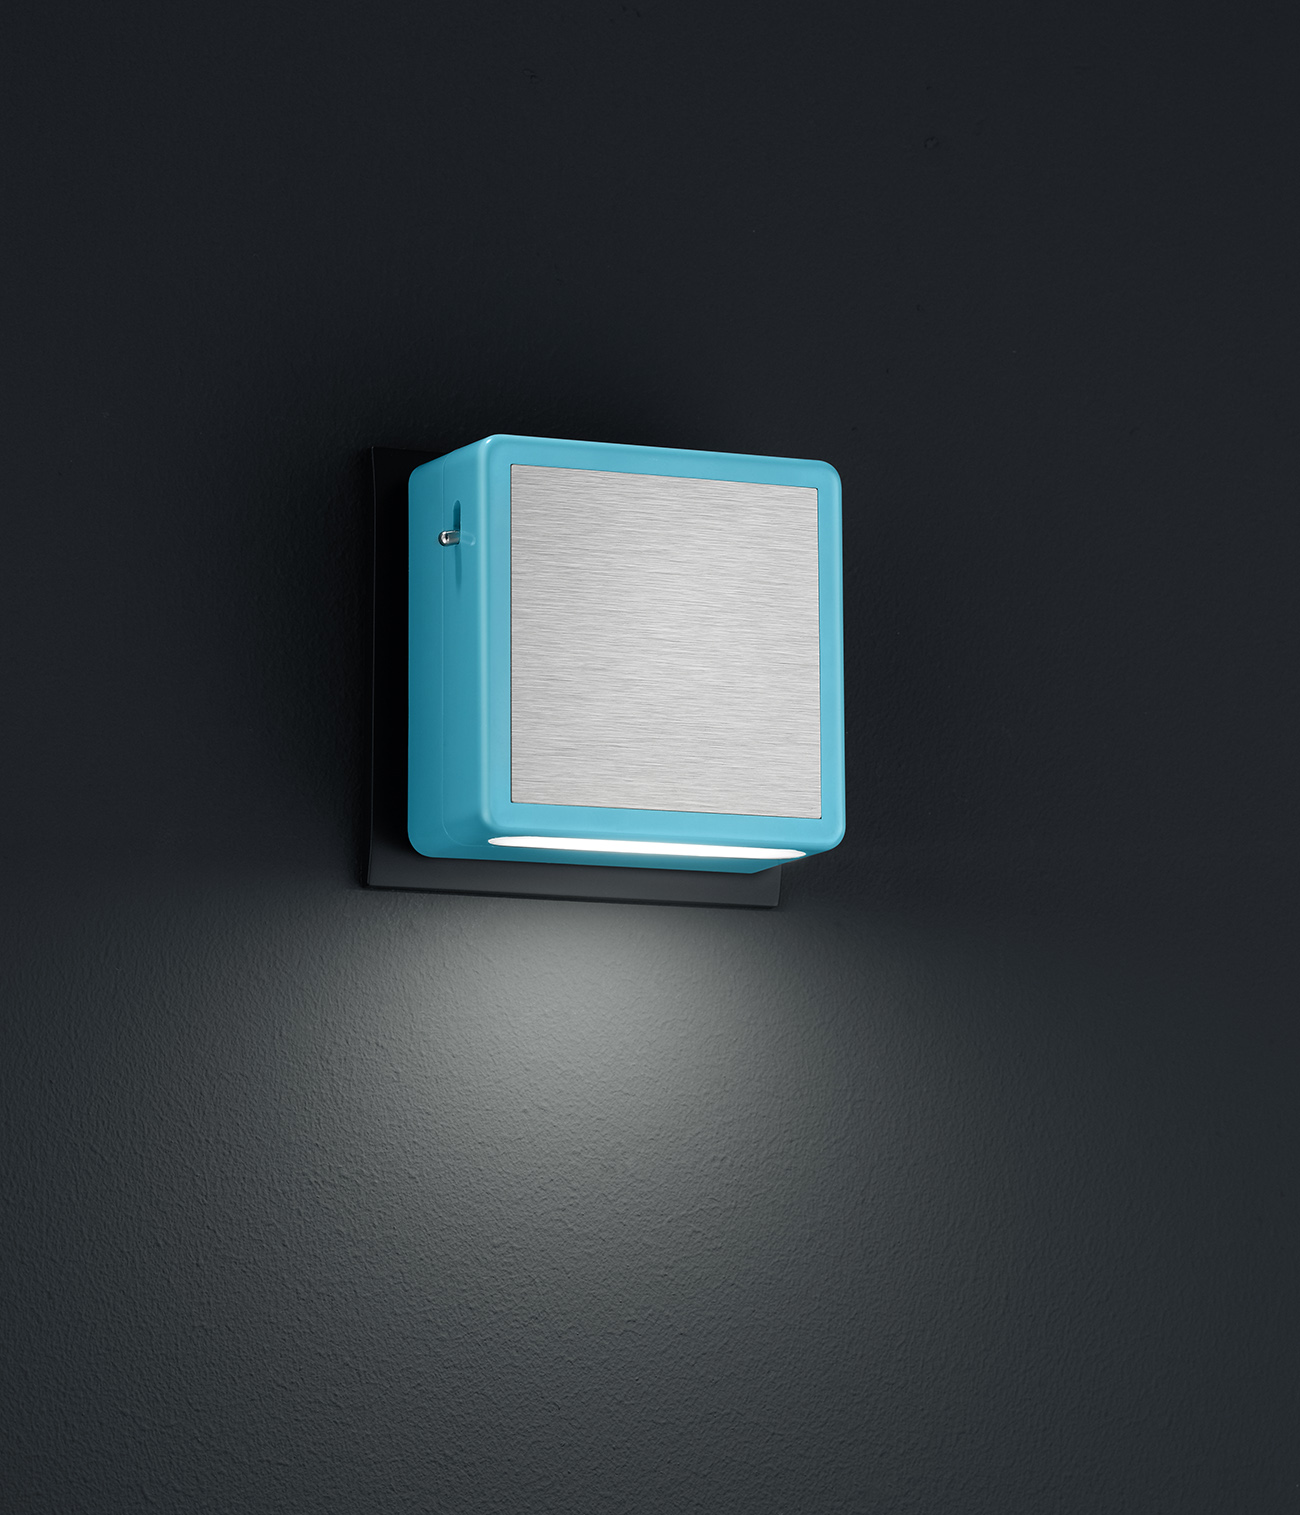 steckdosenleuchte : trio leuchten, led steckdosenleuchte foxi, 25719